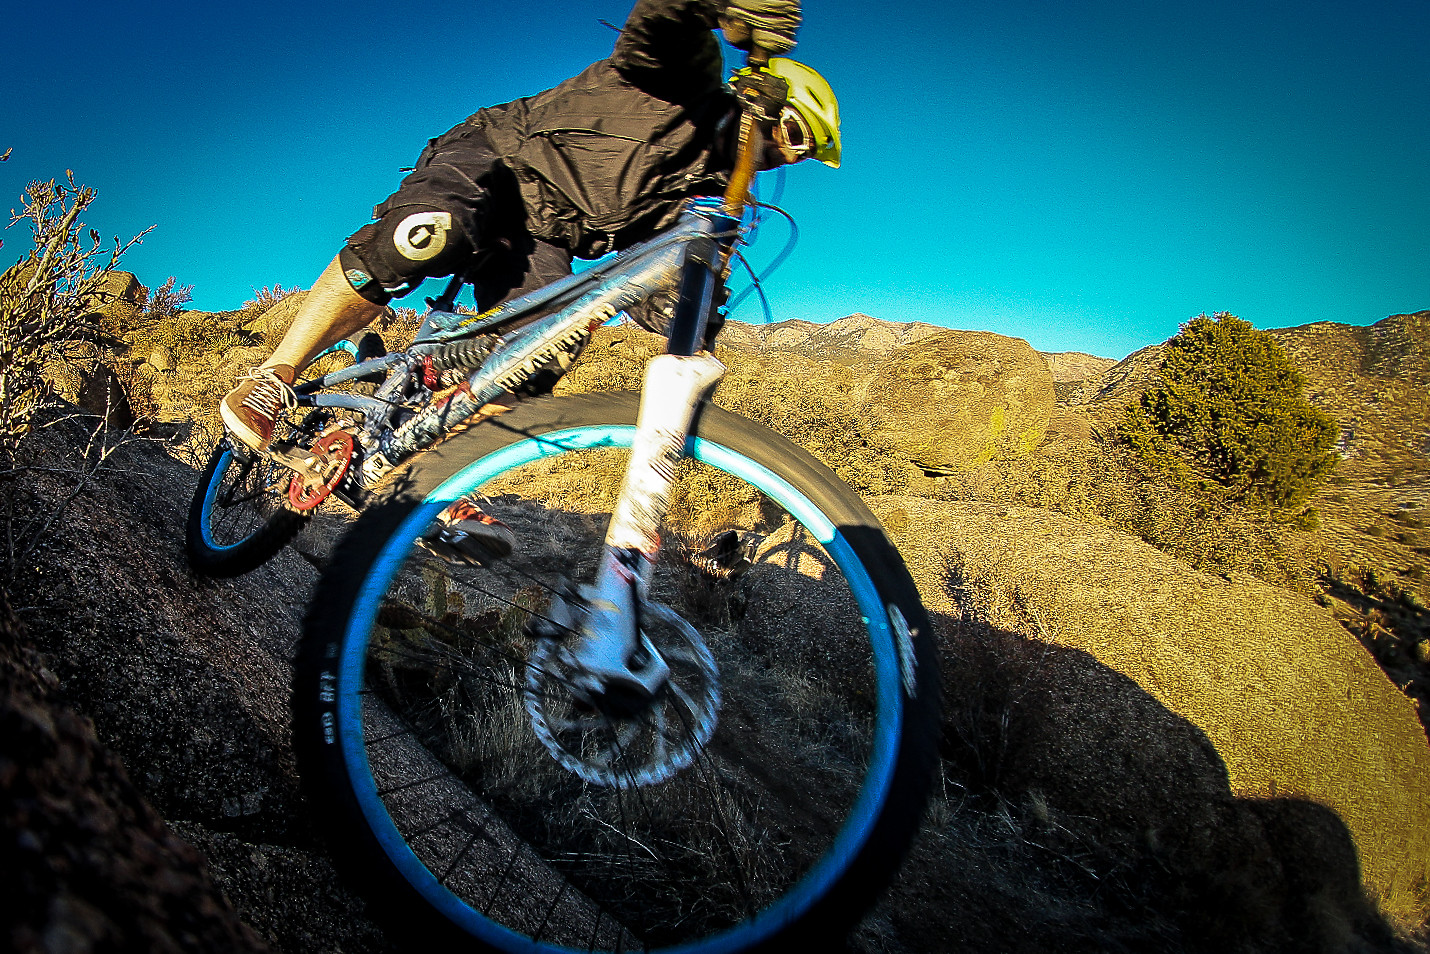 South Foothills 2 - jerryhazard - Mountain Biking Pictures - Vital MTB